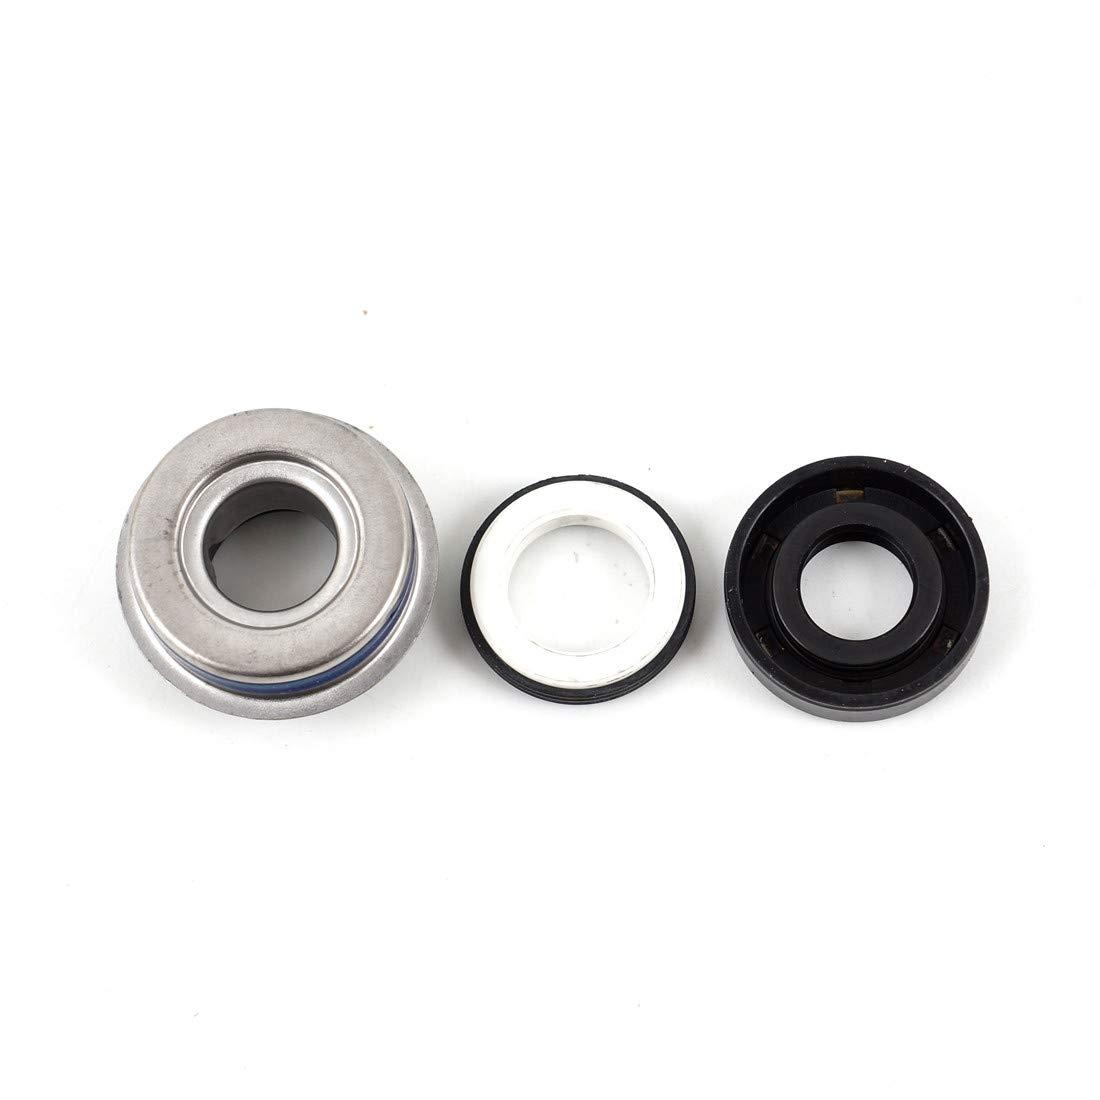 Lanbao Water Pump Mechanical Seal Set For Honda CBR600RR 2003 2004 2005 2006 2007 2008 2009 2010 2011 2012